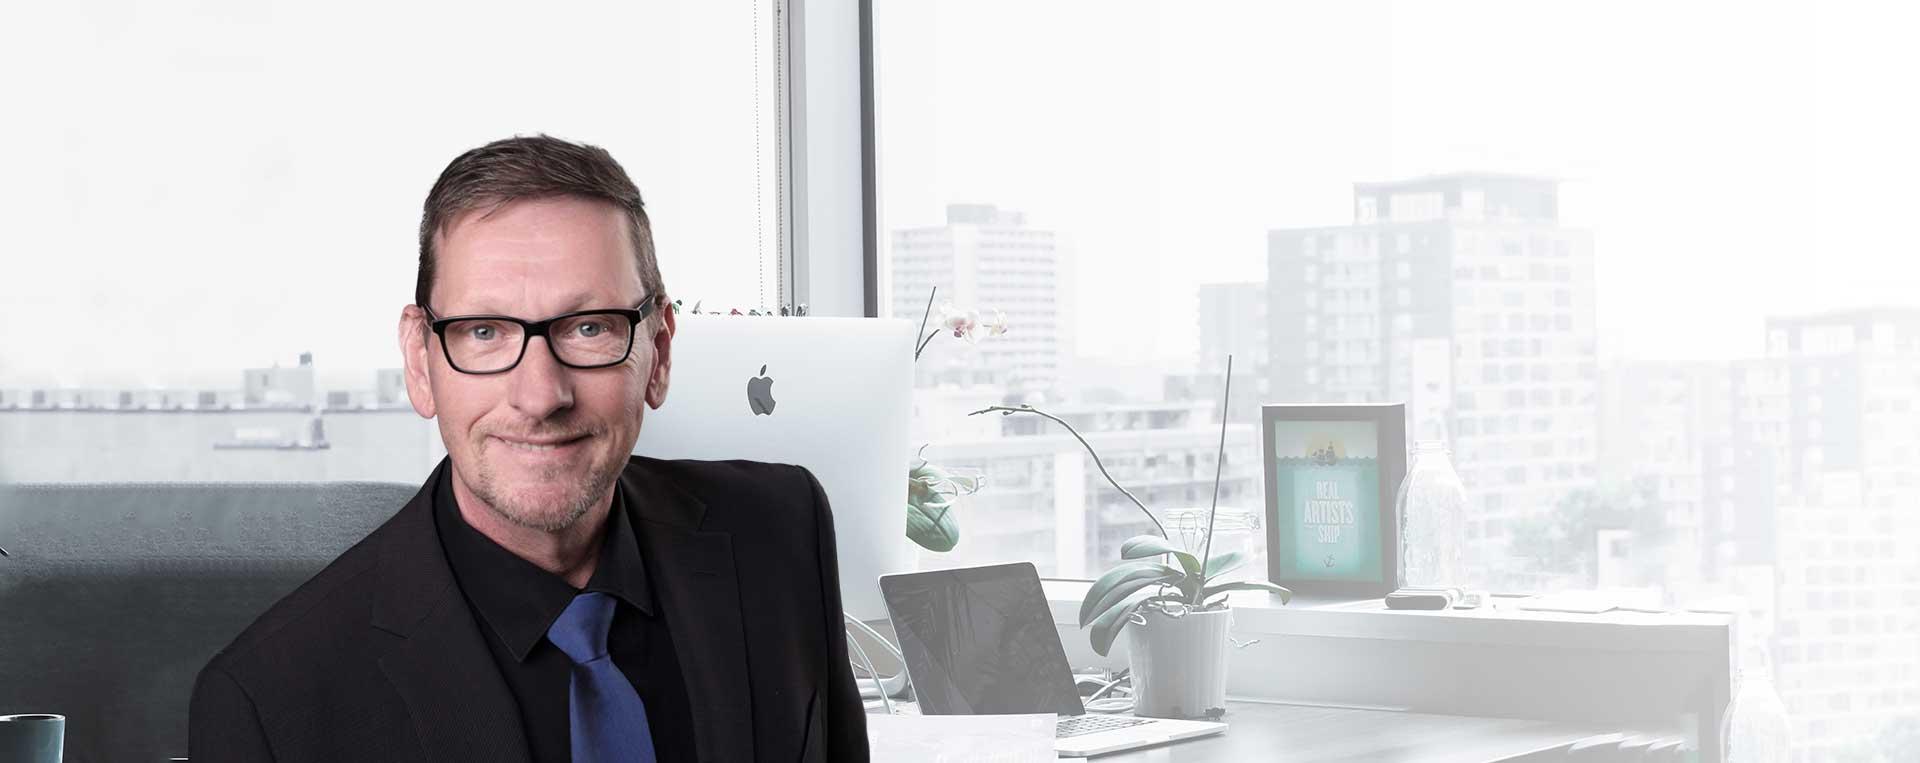 Projektmanager Marketing Thomas Herr im Büro